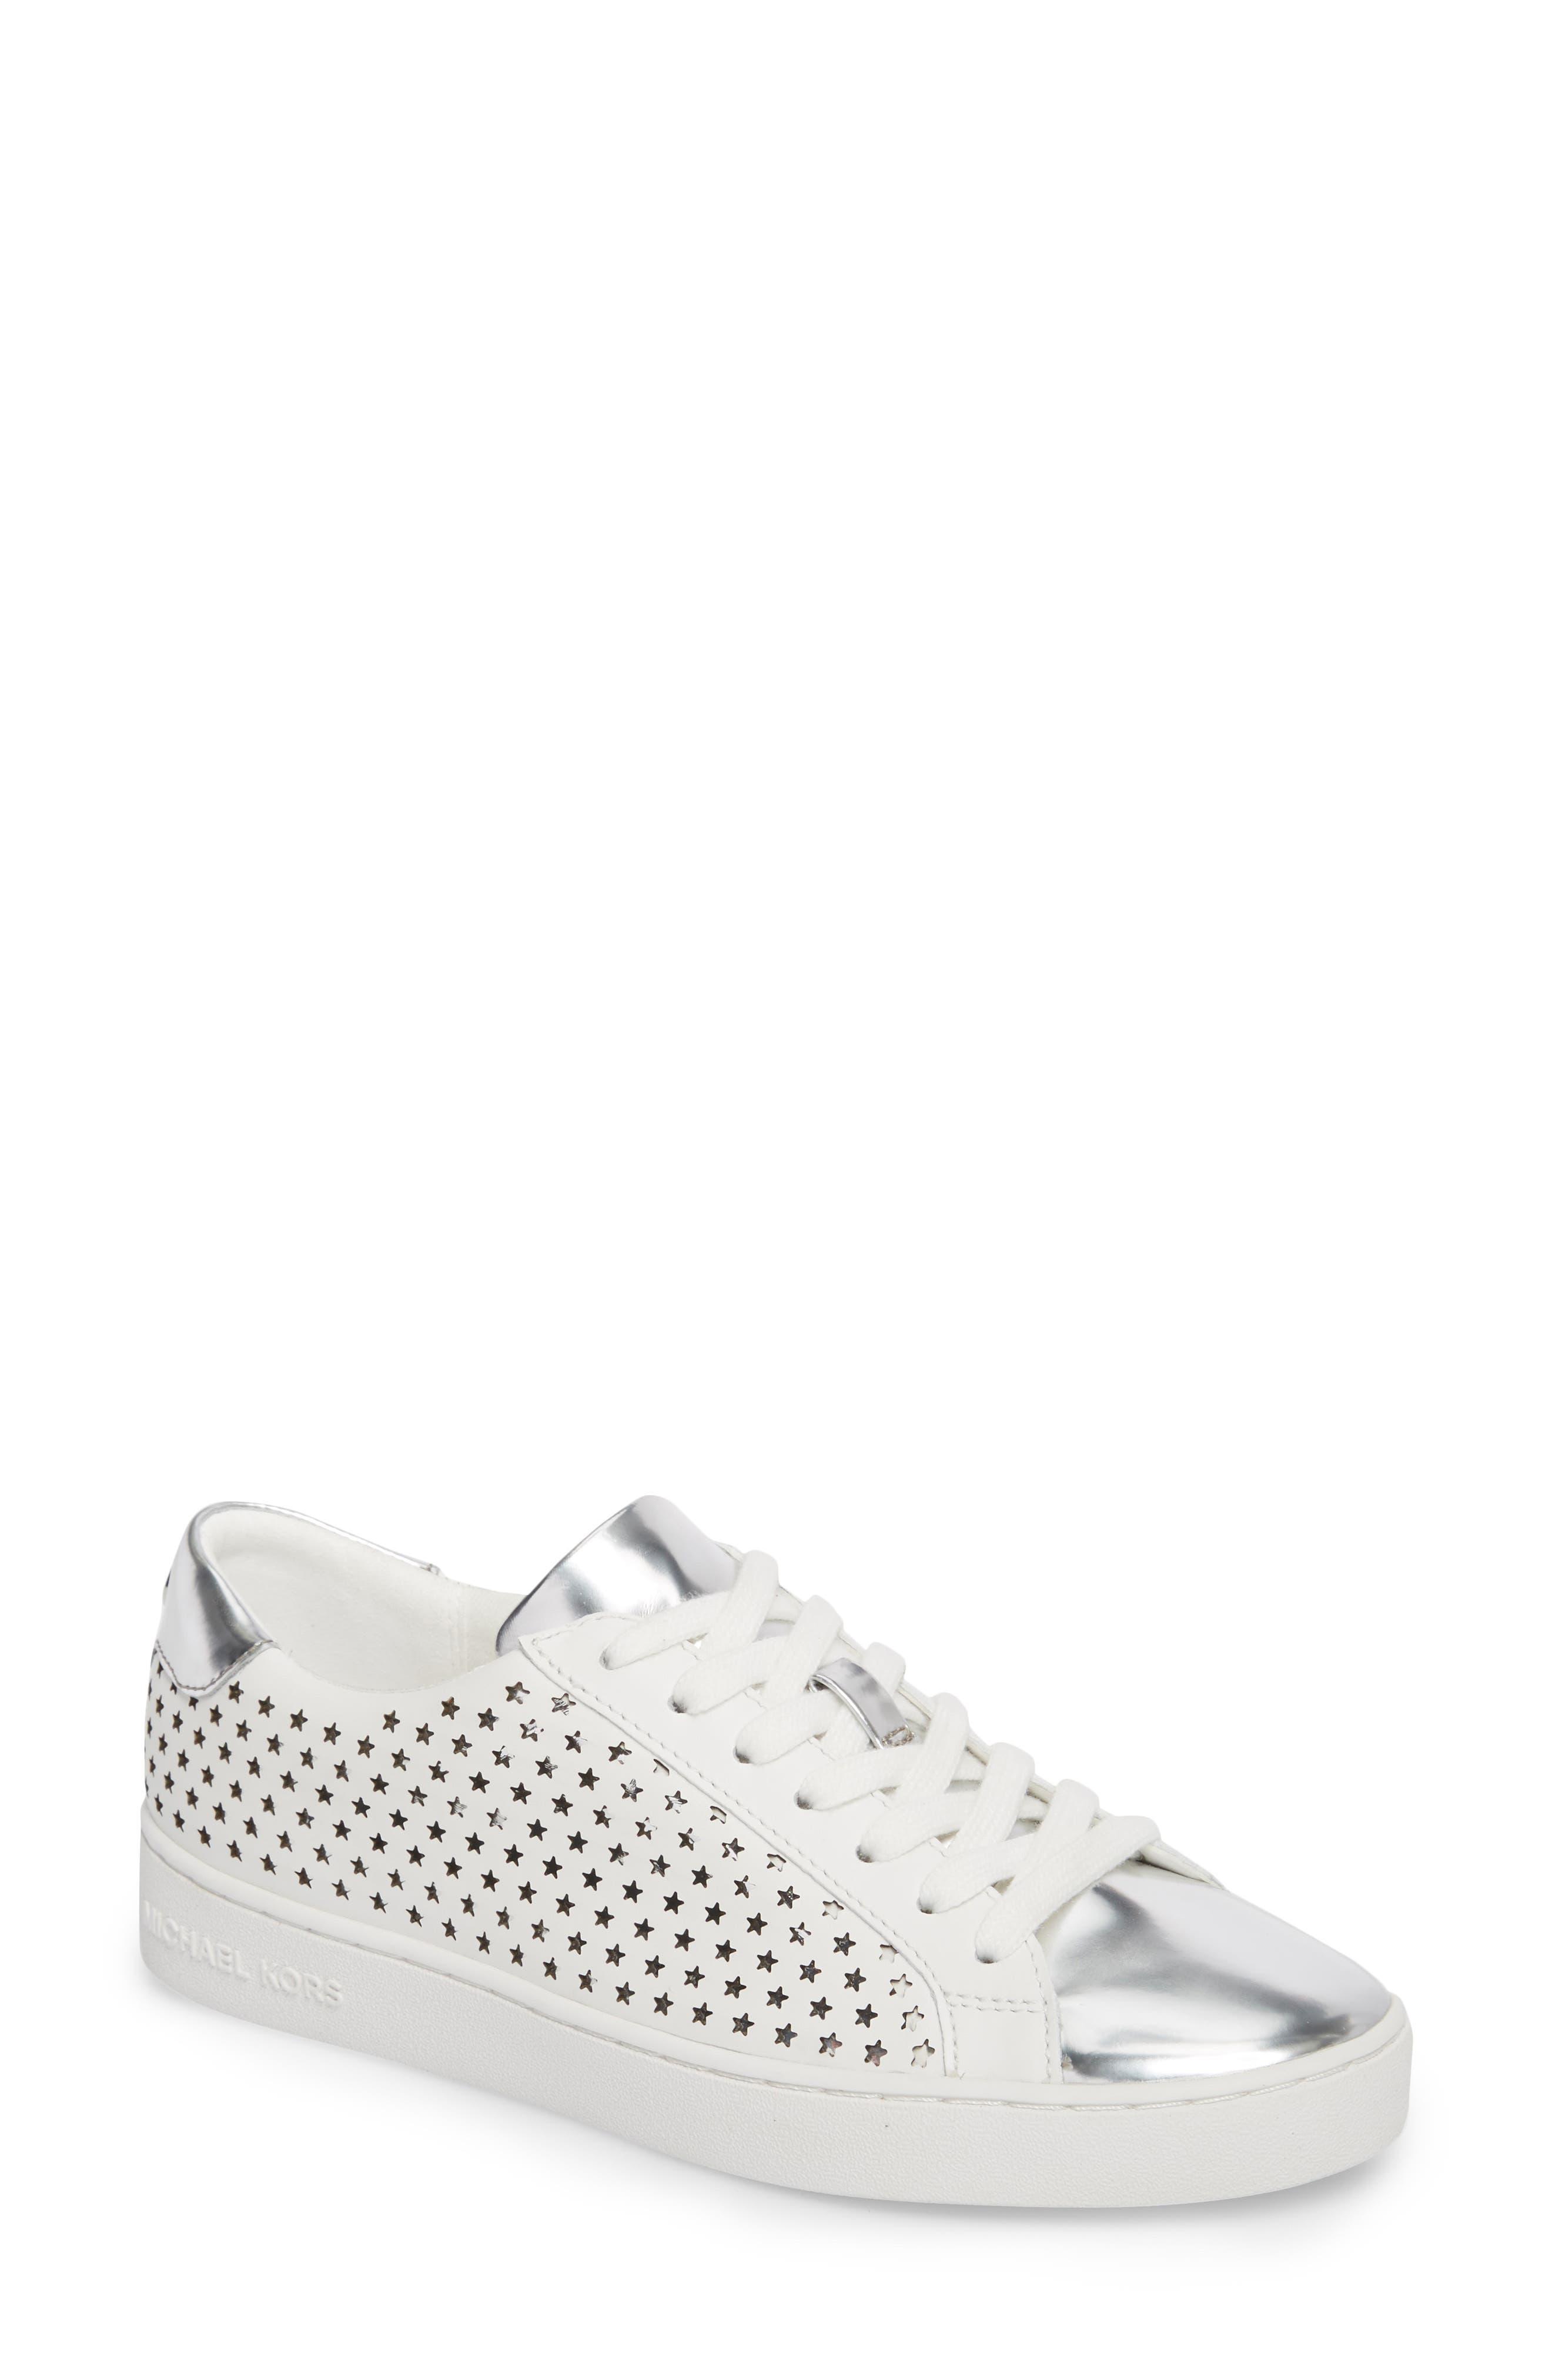 Irving Sneaker,                             Main thumbnail 1, color,                             Optic White